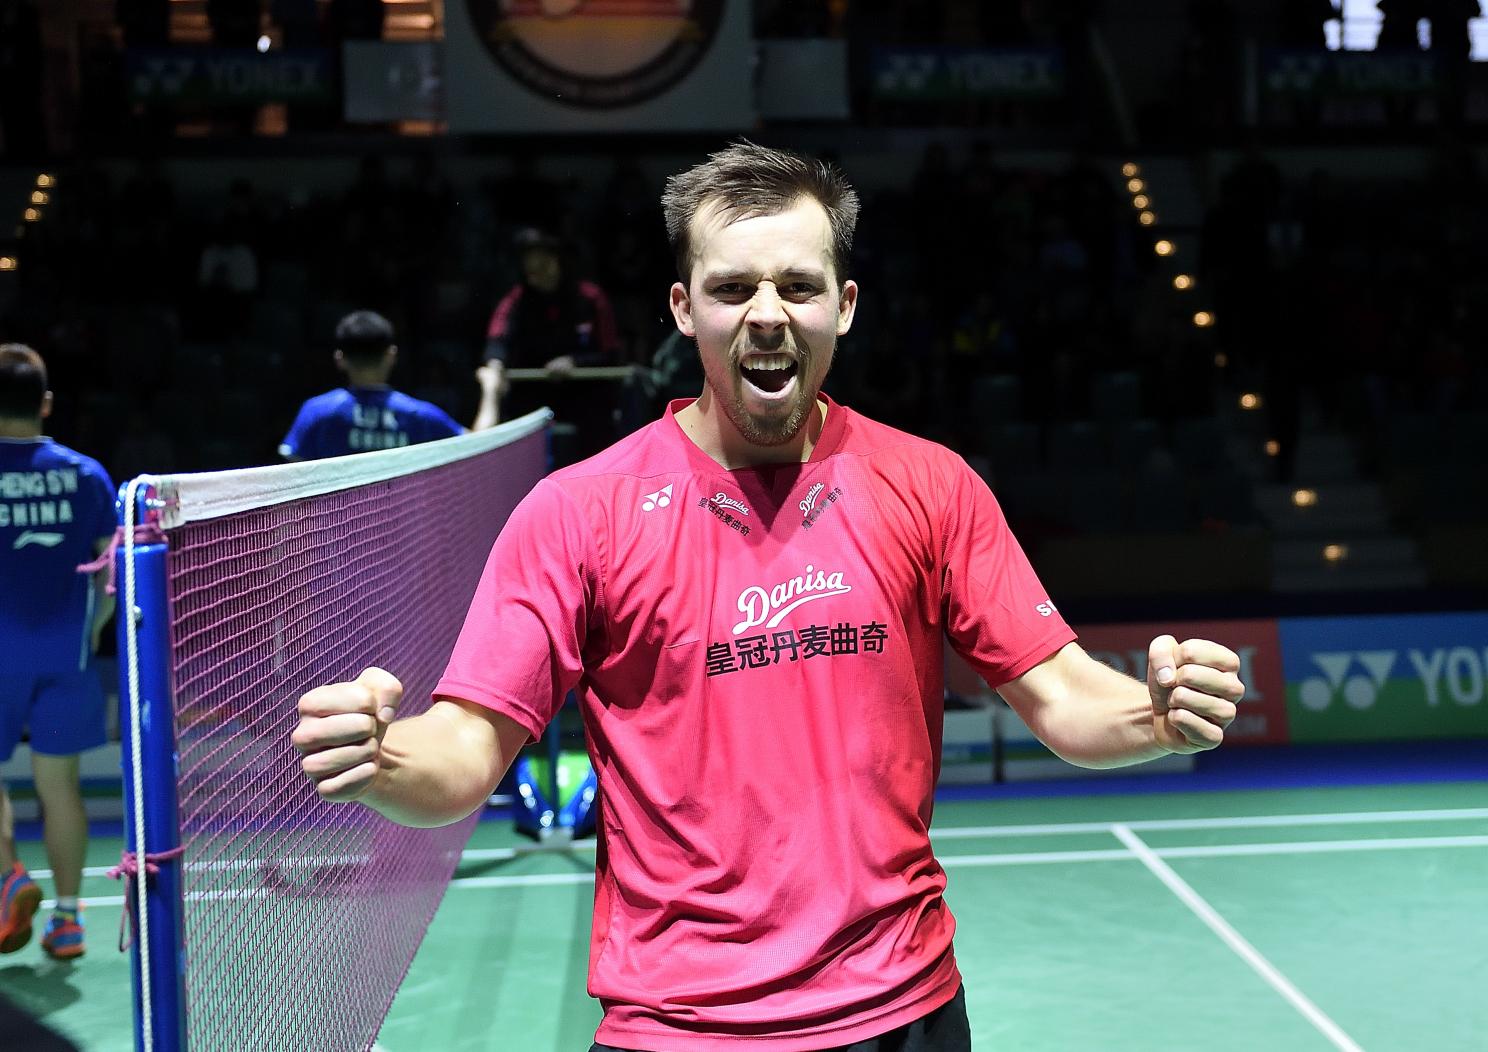 Dänemarks Anders Skaarup Rasmussen freut sich über den Halbfinaleinzug mit Partner Kim Astrup im Herrendoppel